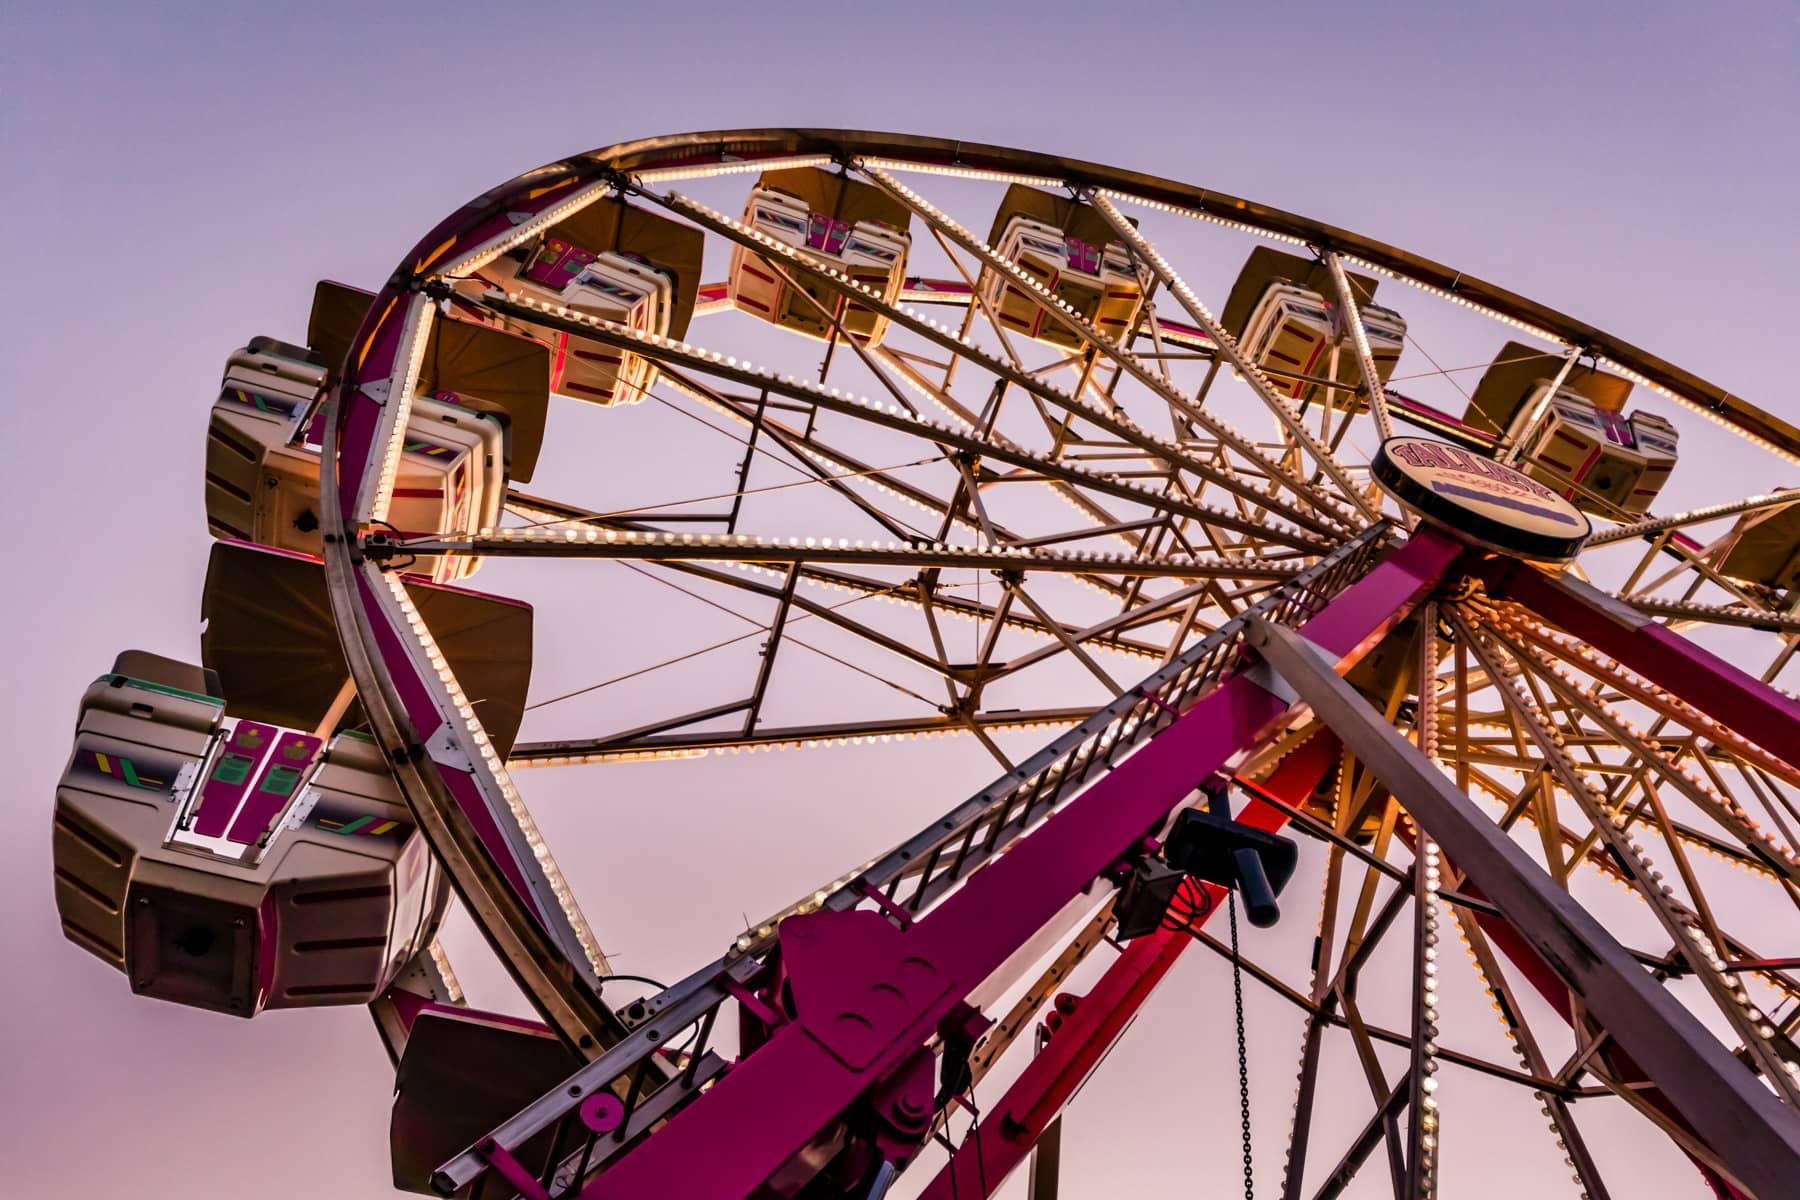 A ferris wheel rises into the evening sky at Addison, Texas' Taste Addison festival.